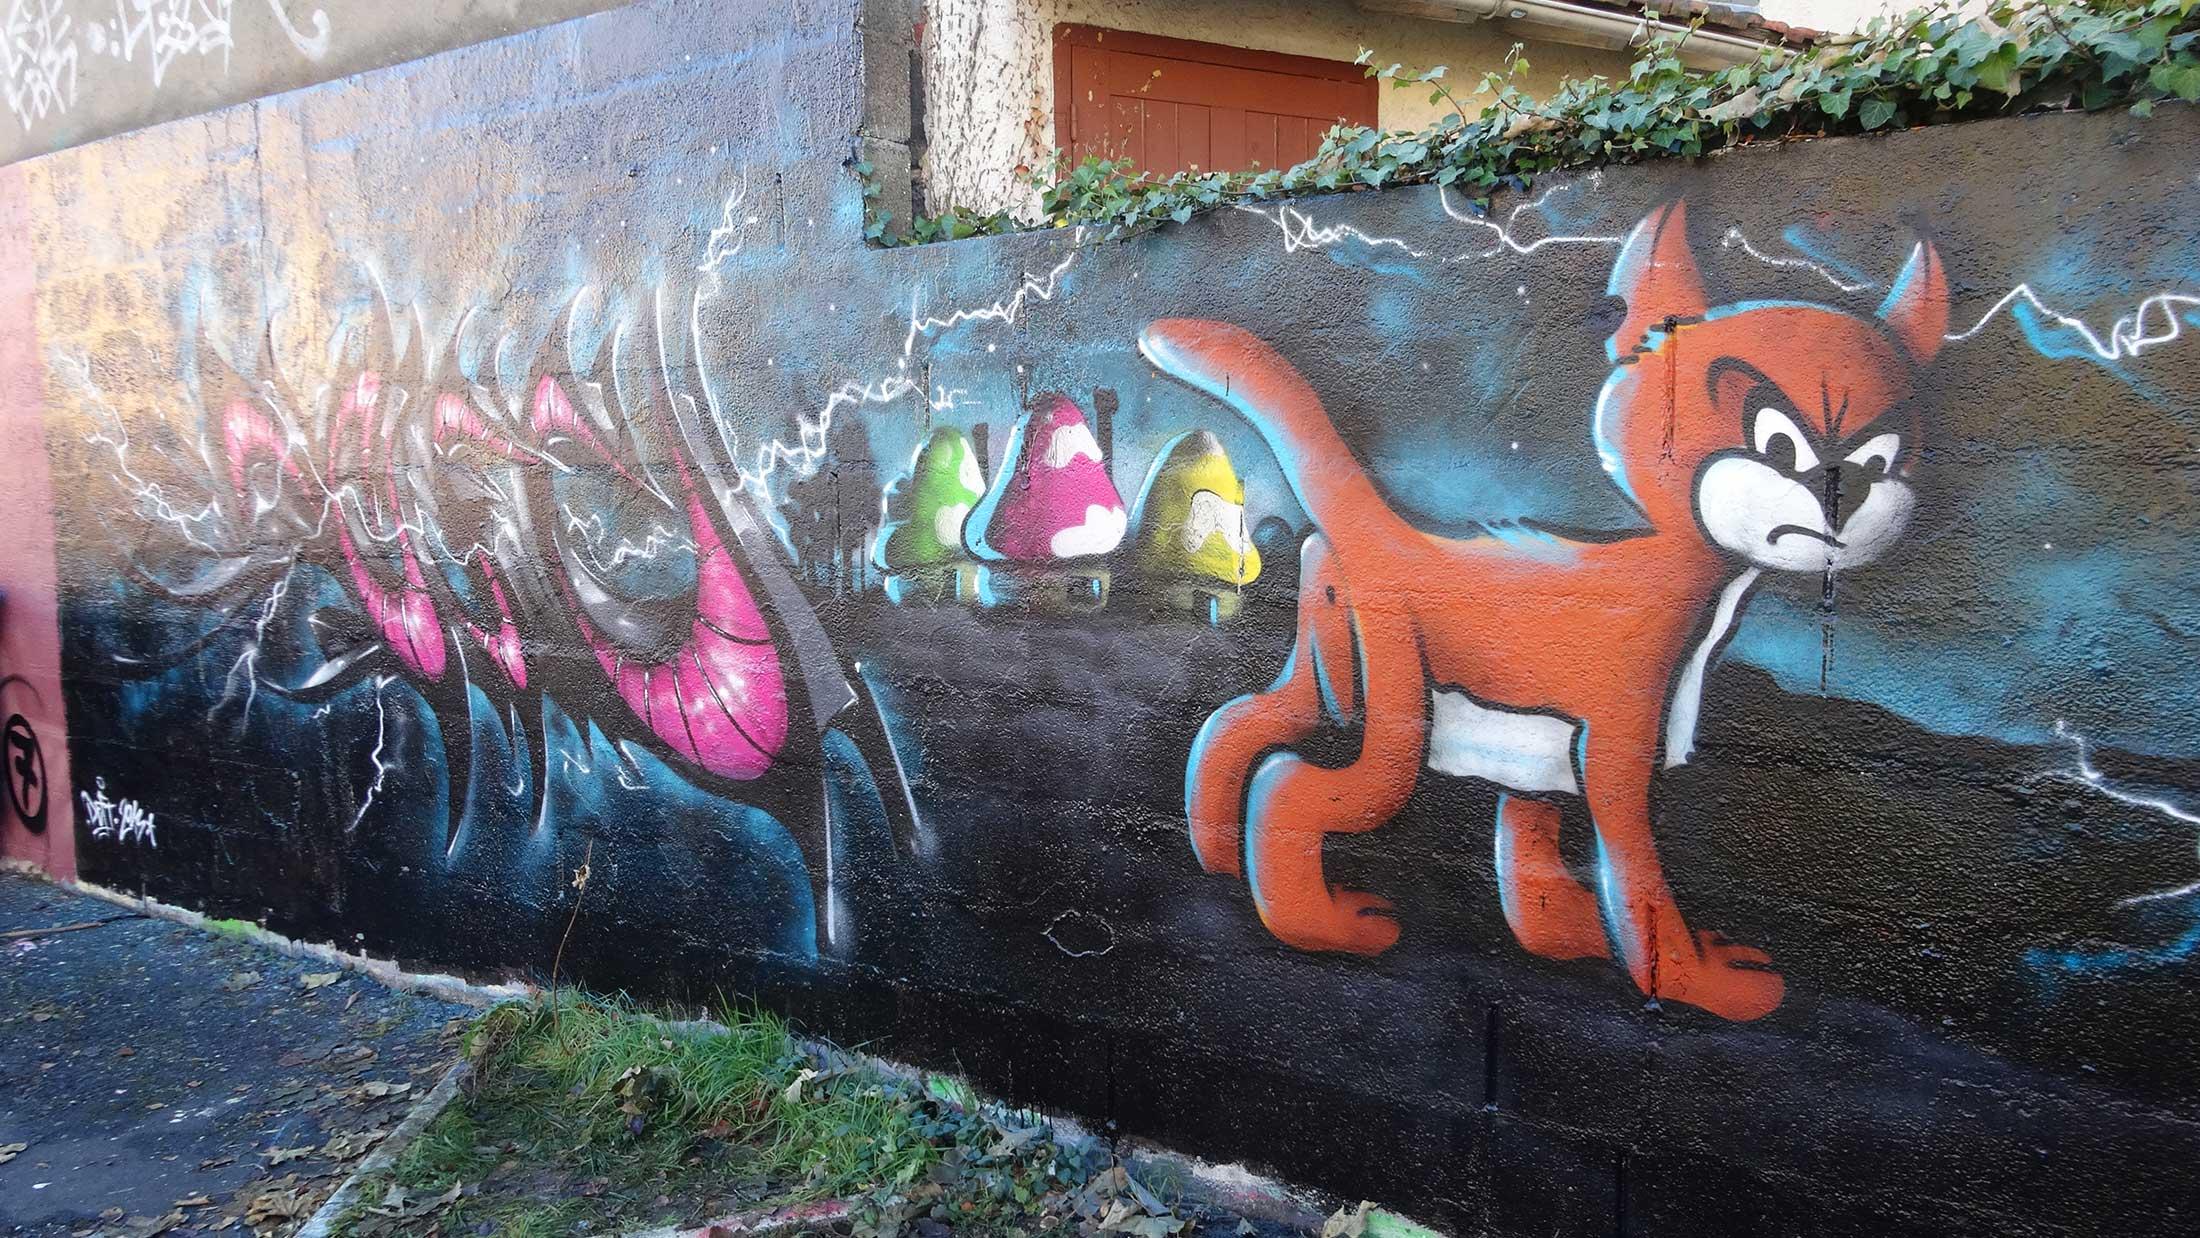 graffiti_Schroumph_deft_2013_4